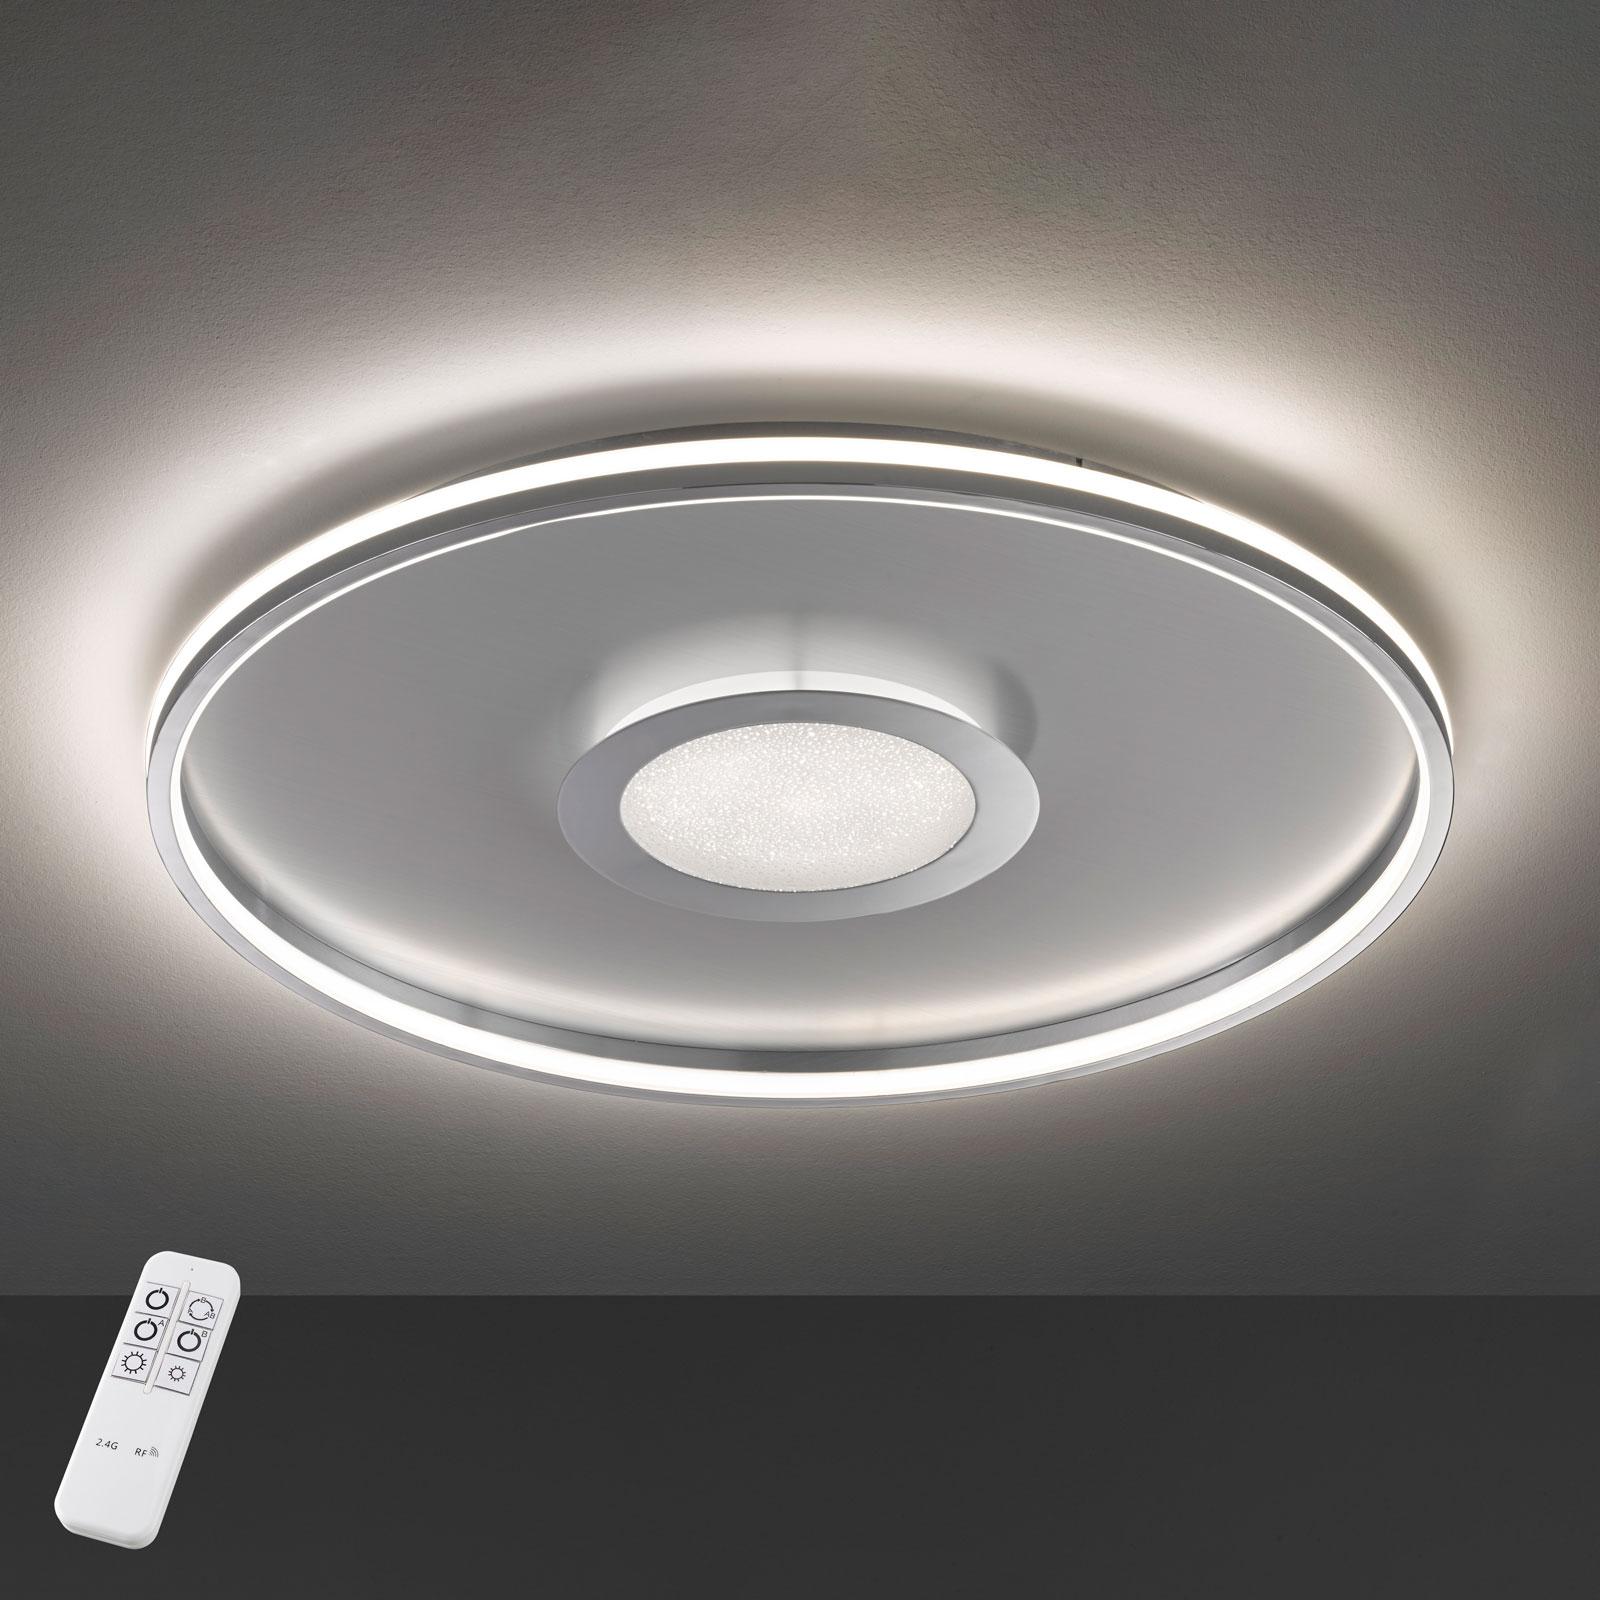 LED plafondlamp Bug rond, chroom, 60cm